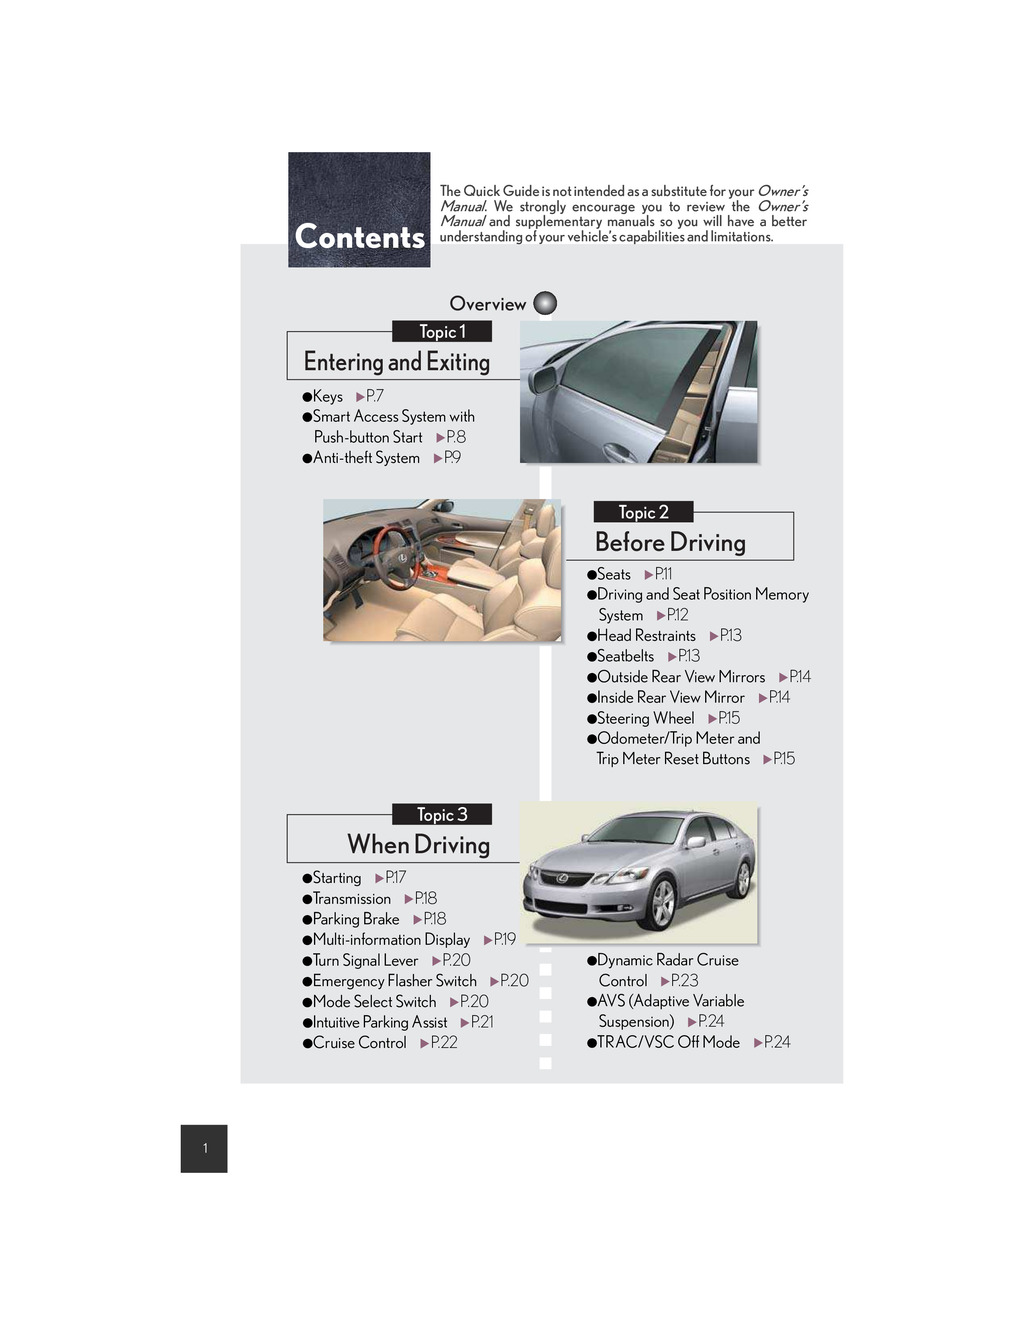 2007 Lexus Gs350 owners manual